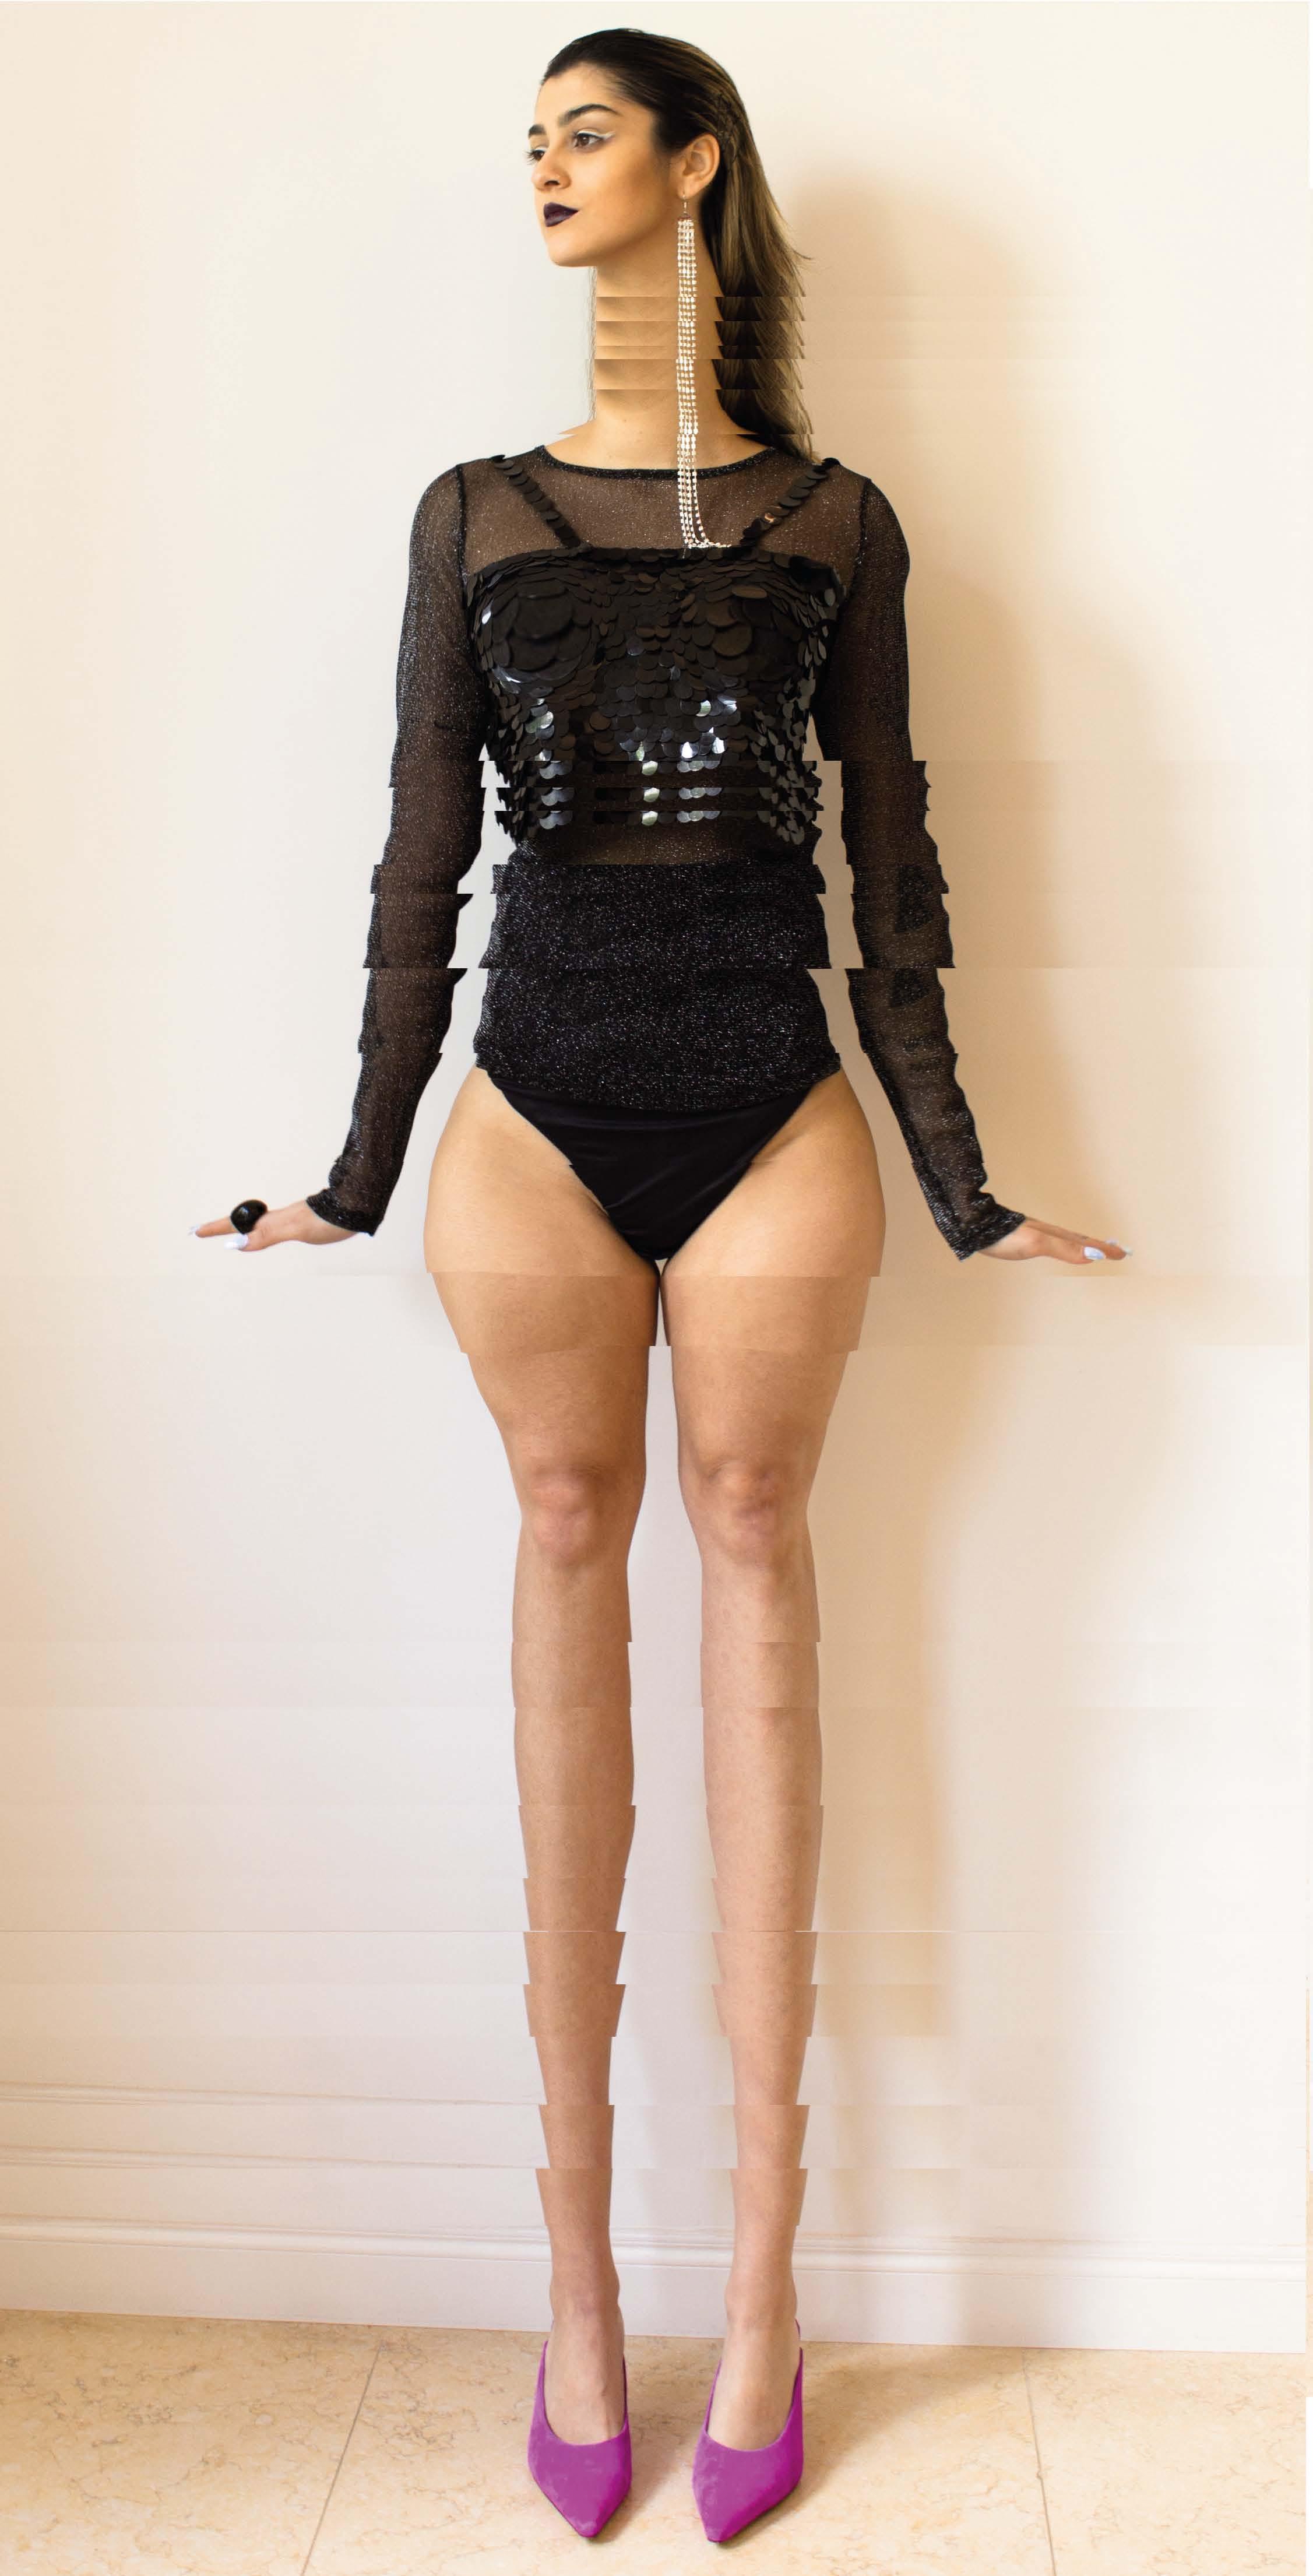 Jaqueline_Vuelma_Body_Diversity.jpg